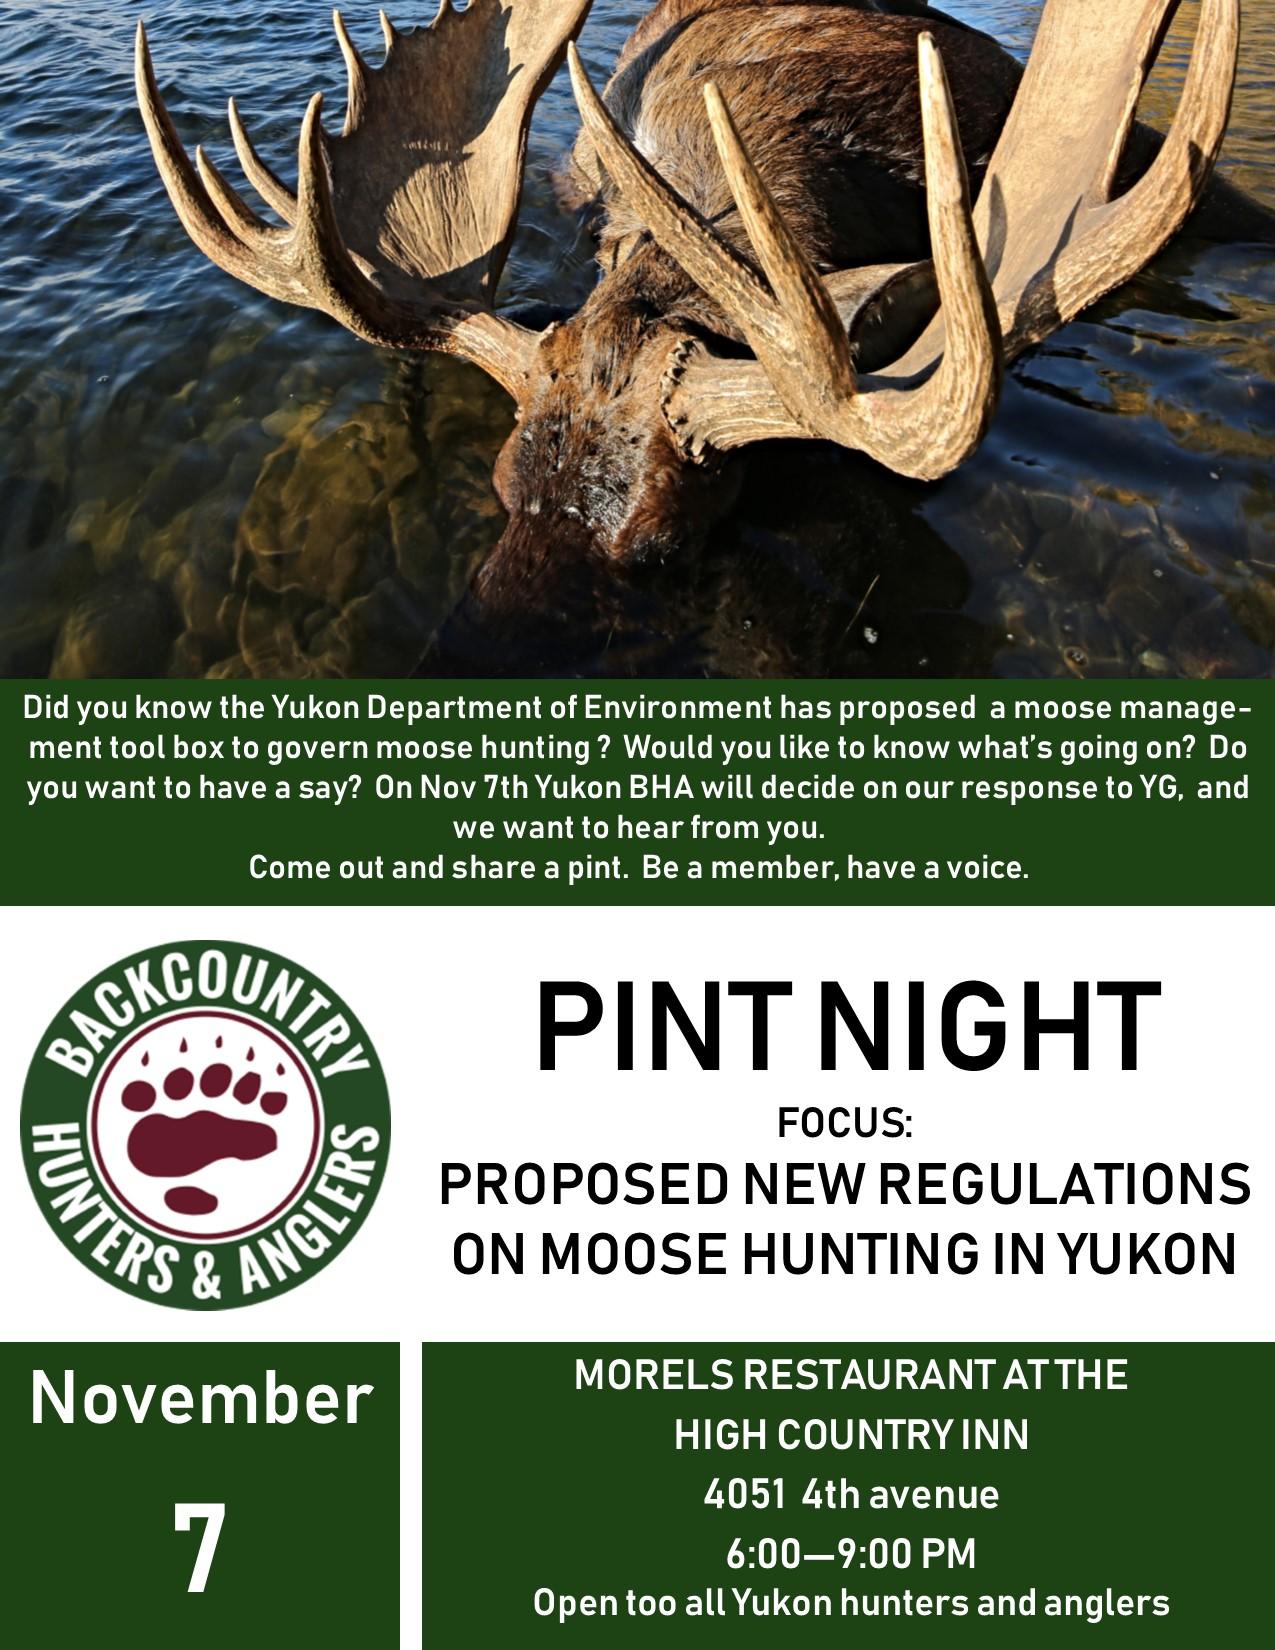 pint_night_November_7__proposed_new_moose_harvest_regulations.jpg